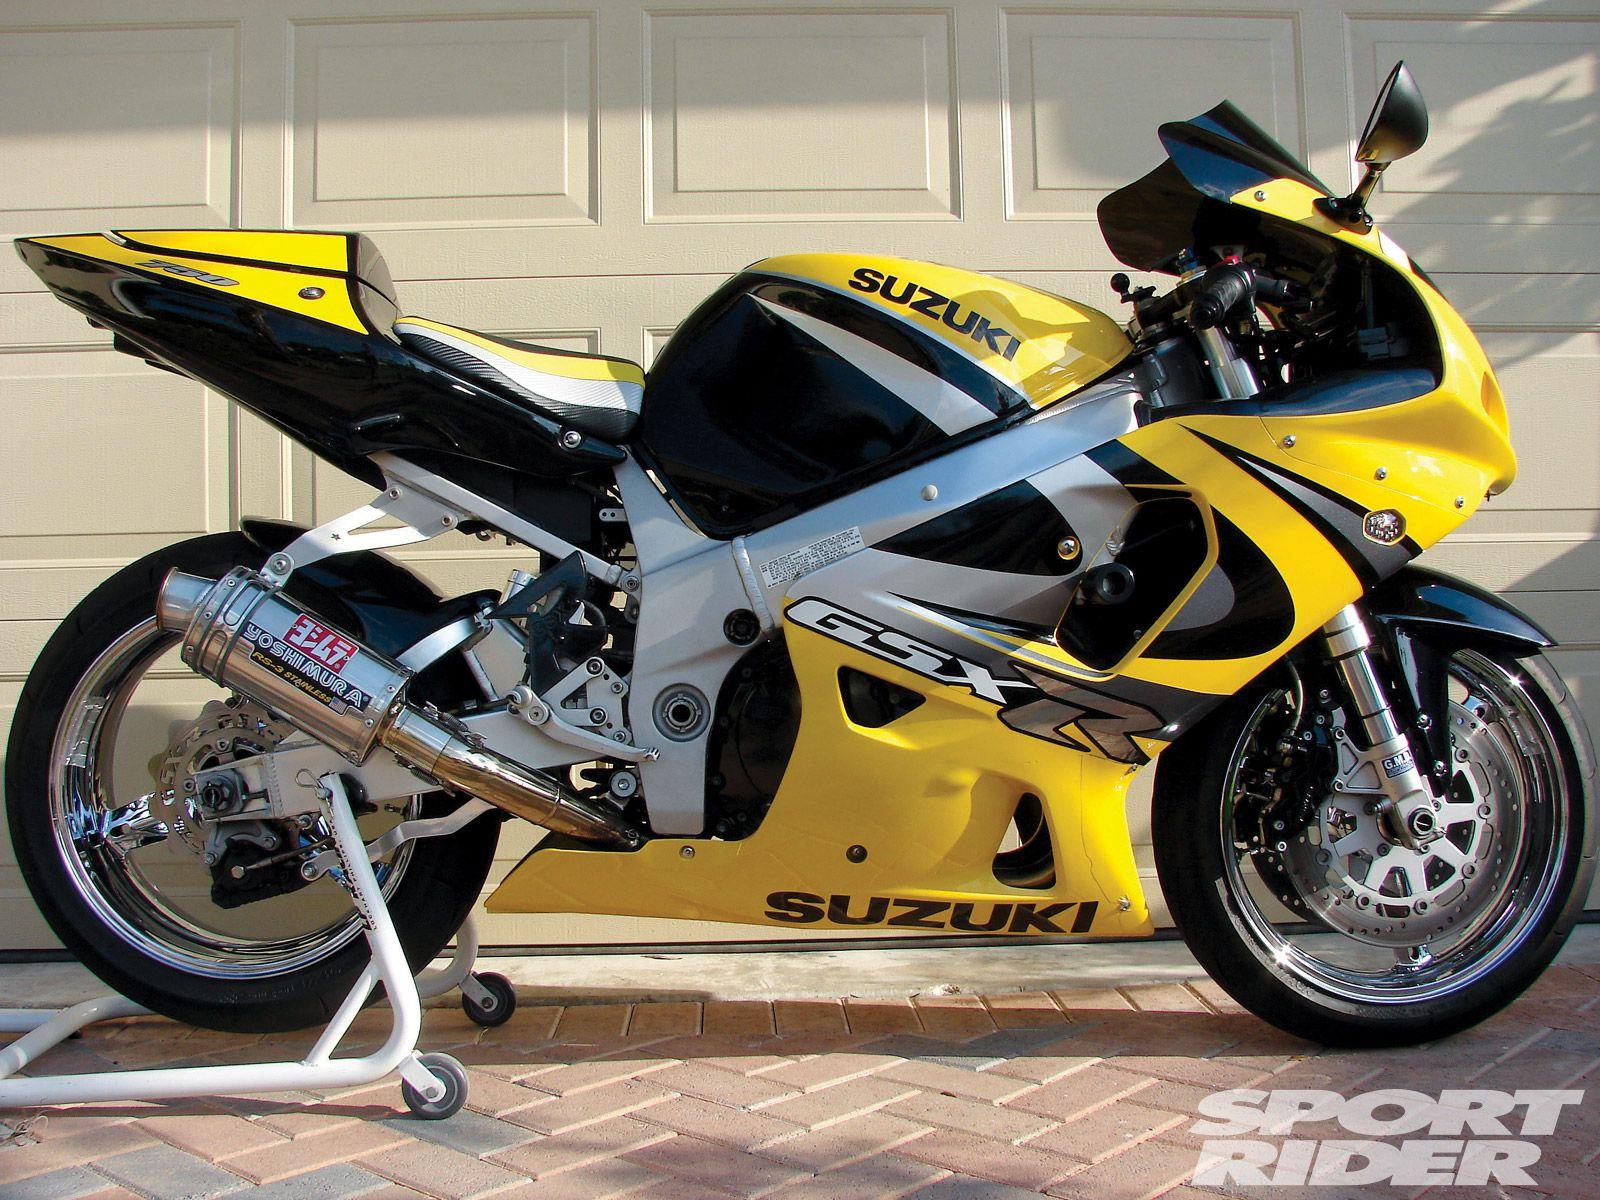 1996-2000 Suzuki GSX-R750 - Great Sportbikes of the Past